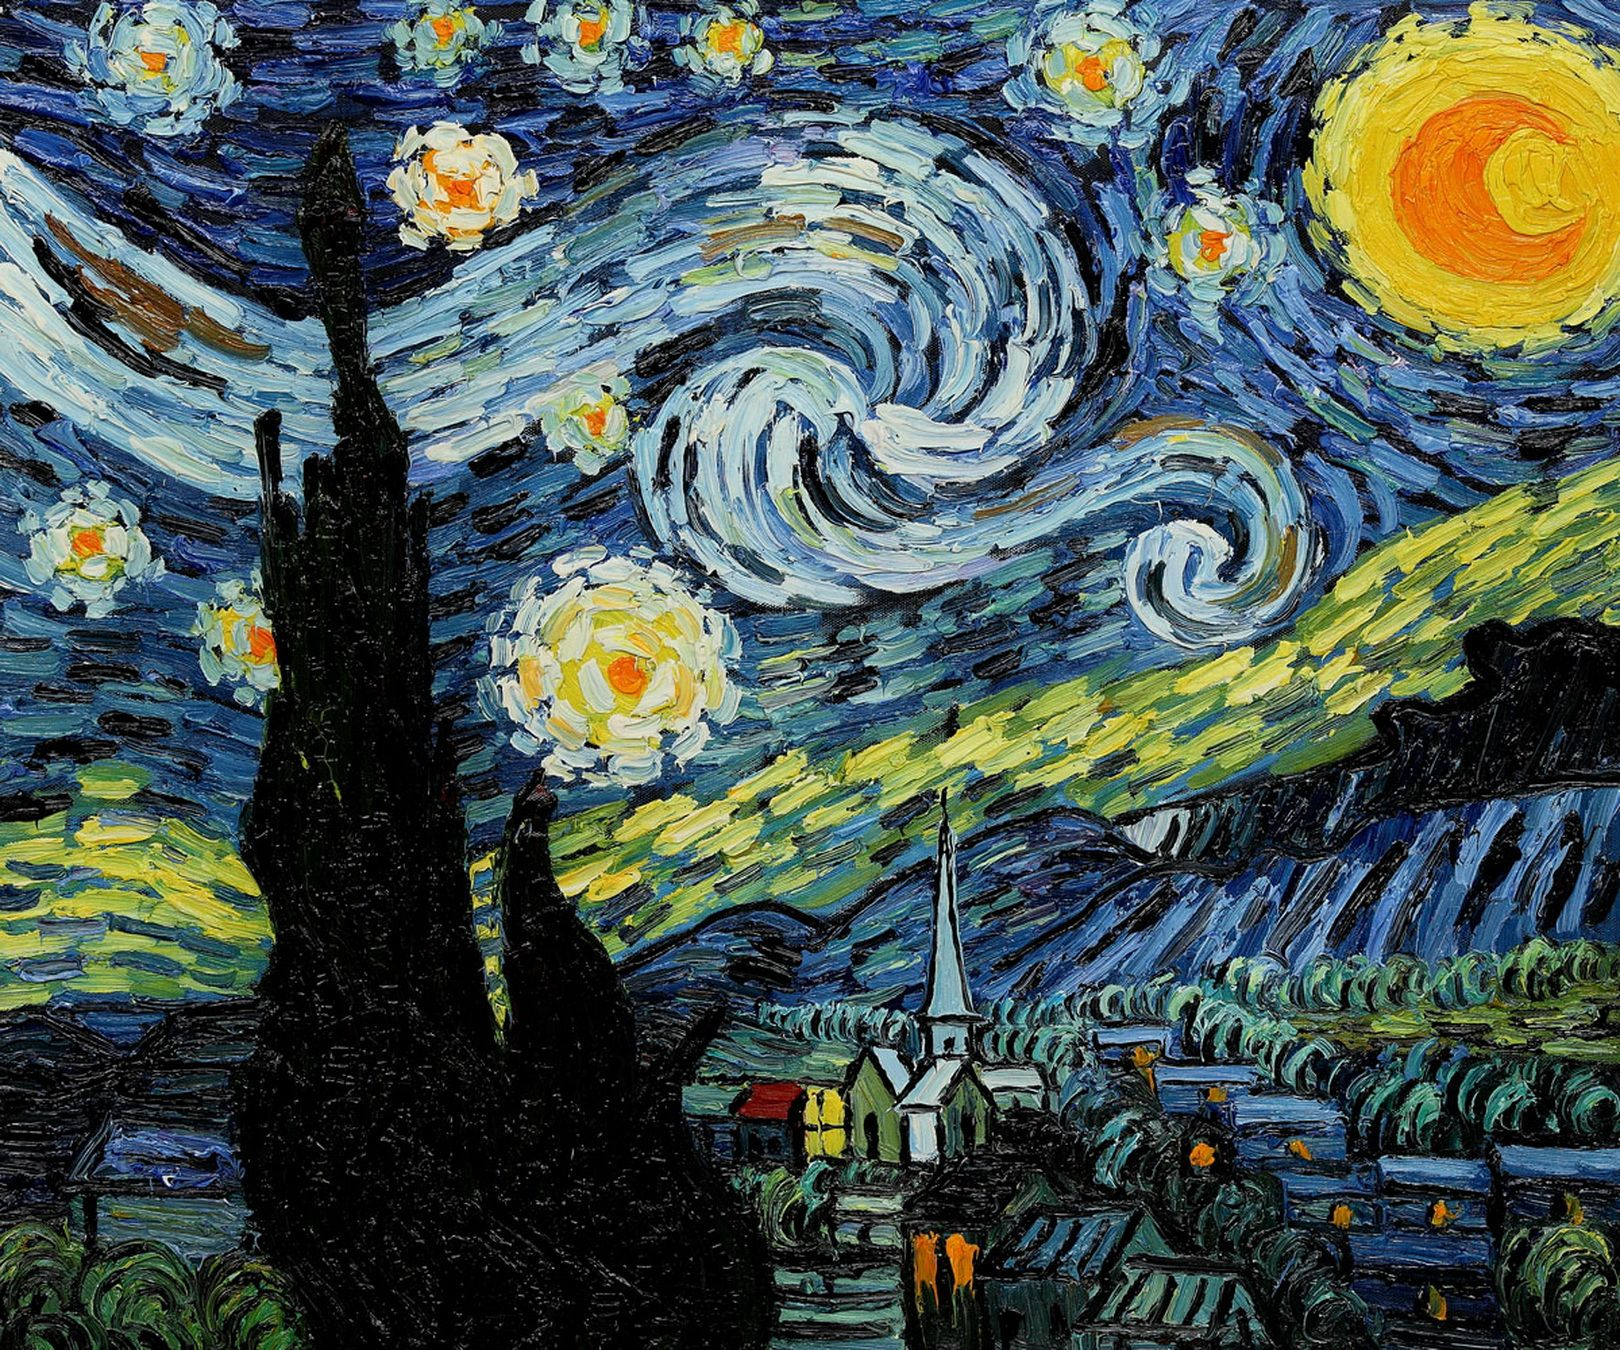 Pablo Picasso Most Famous Painting | ... : Pablo Picasso's ...